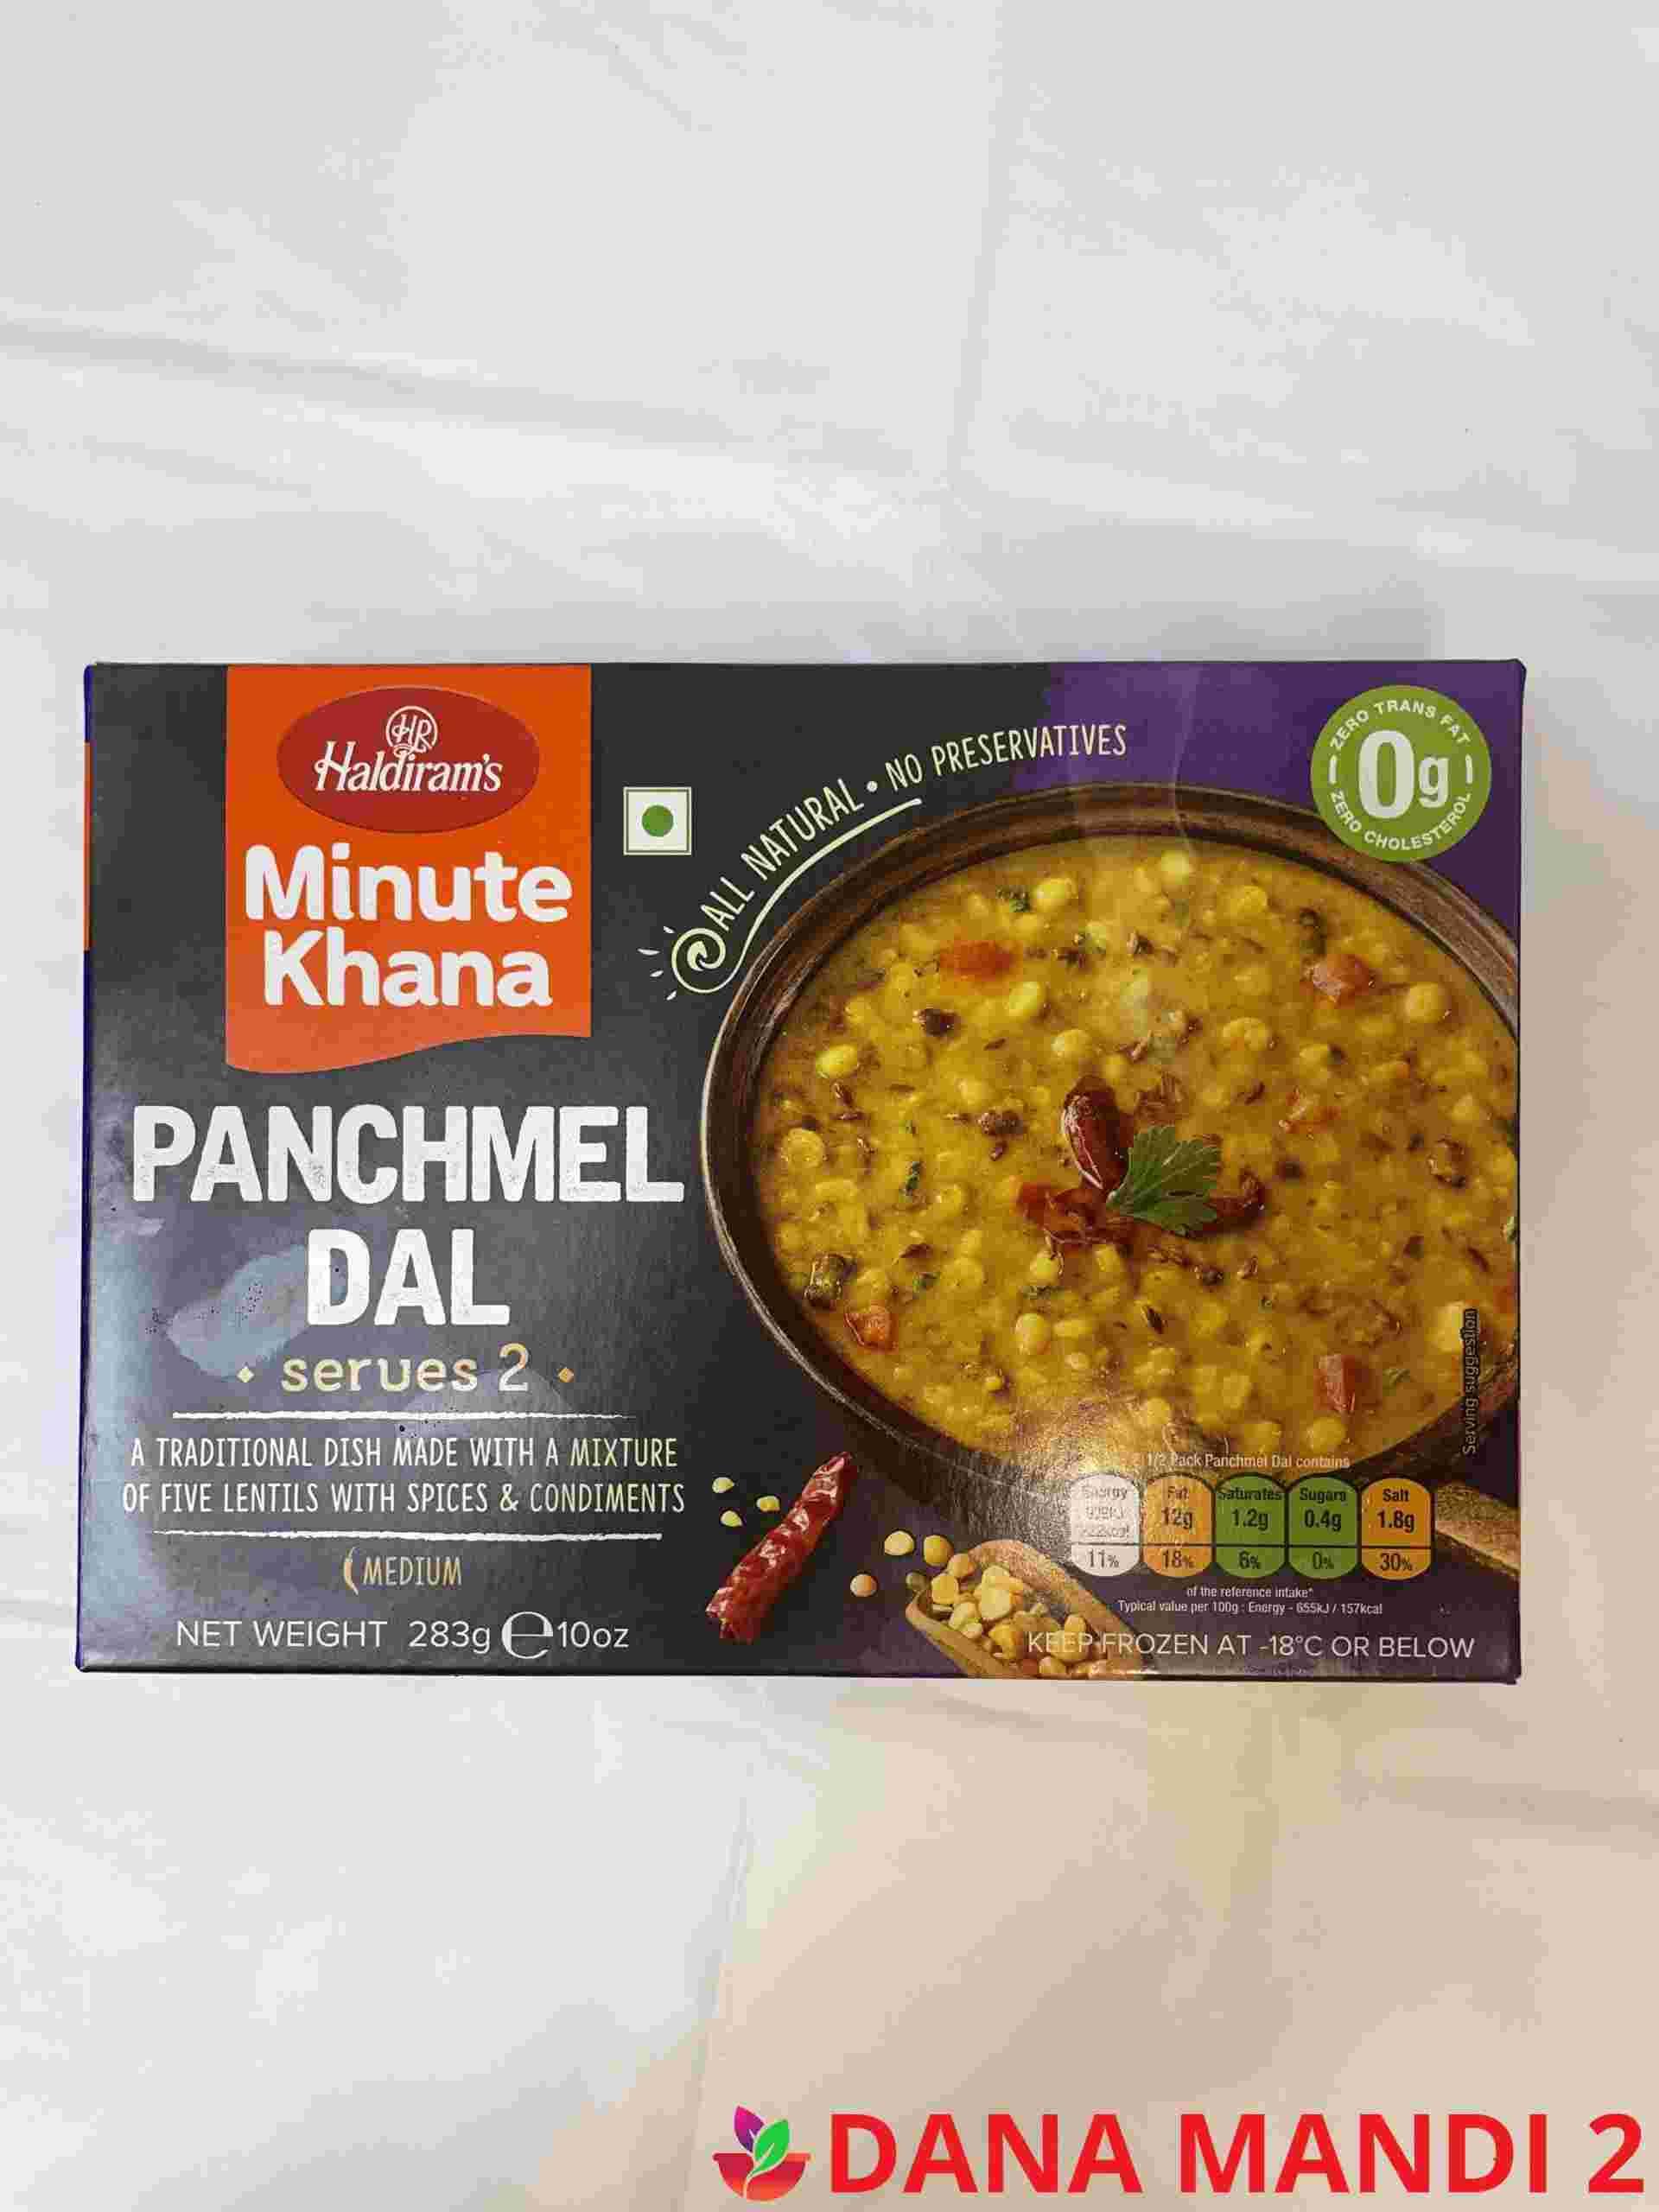 Haldiram's Panchmel Dal